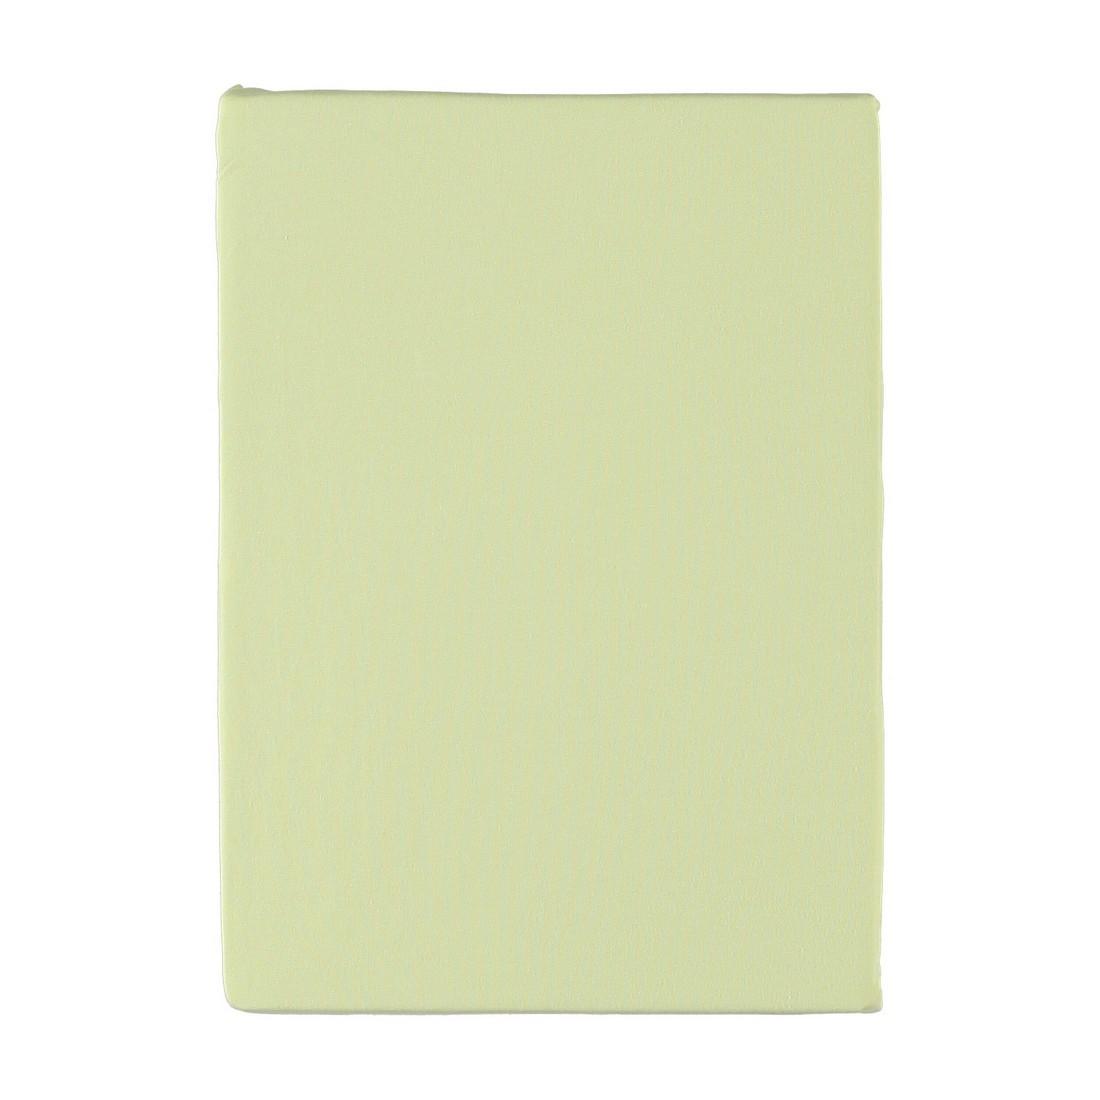 Spannbetttuch Elastic 5002 – Elasthan – 95% Baumwolle – 5% Elasthan lilie – 16 – Abmessung: 200 x 200 cm, Janine kaufen